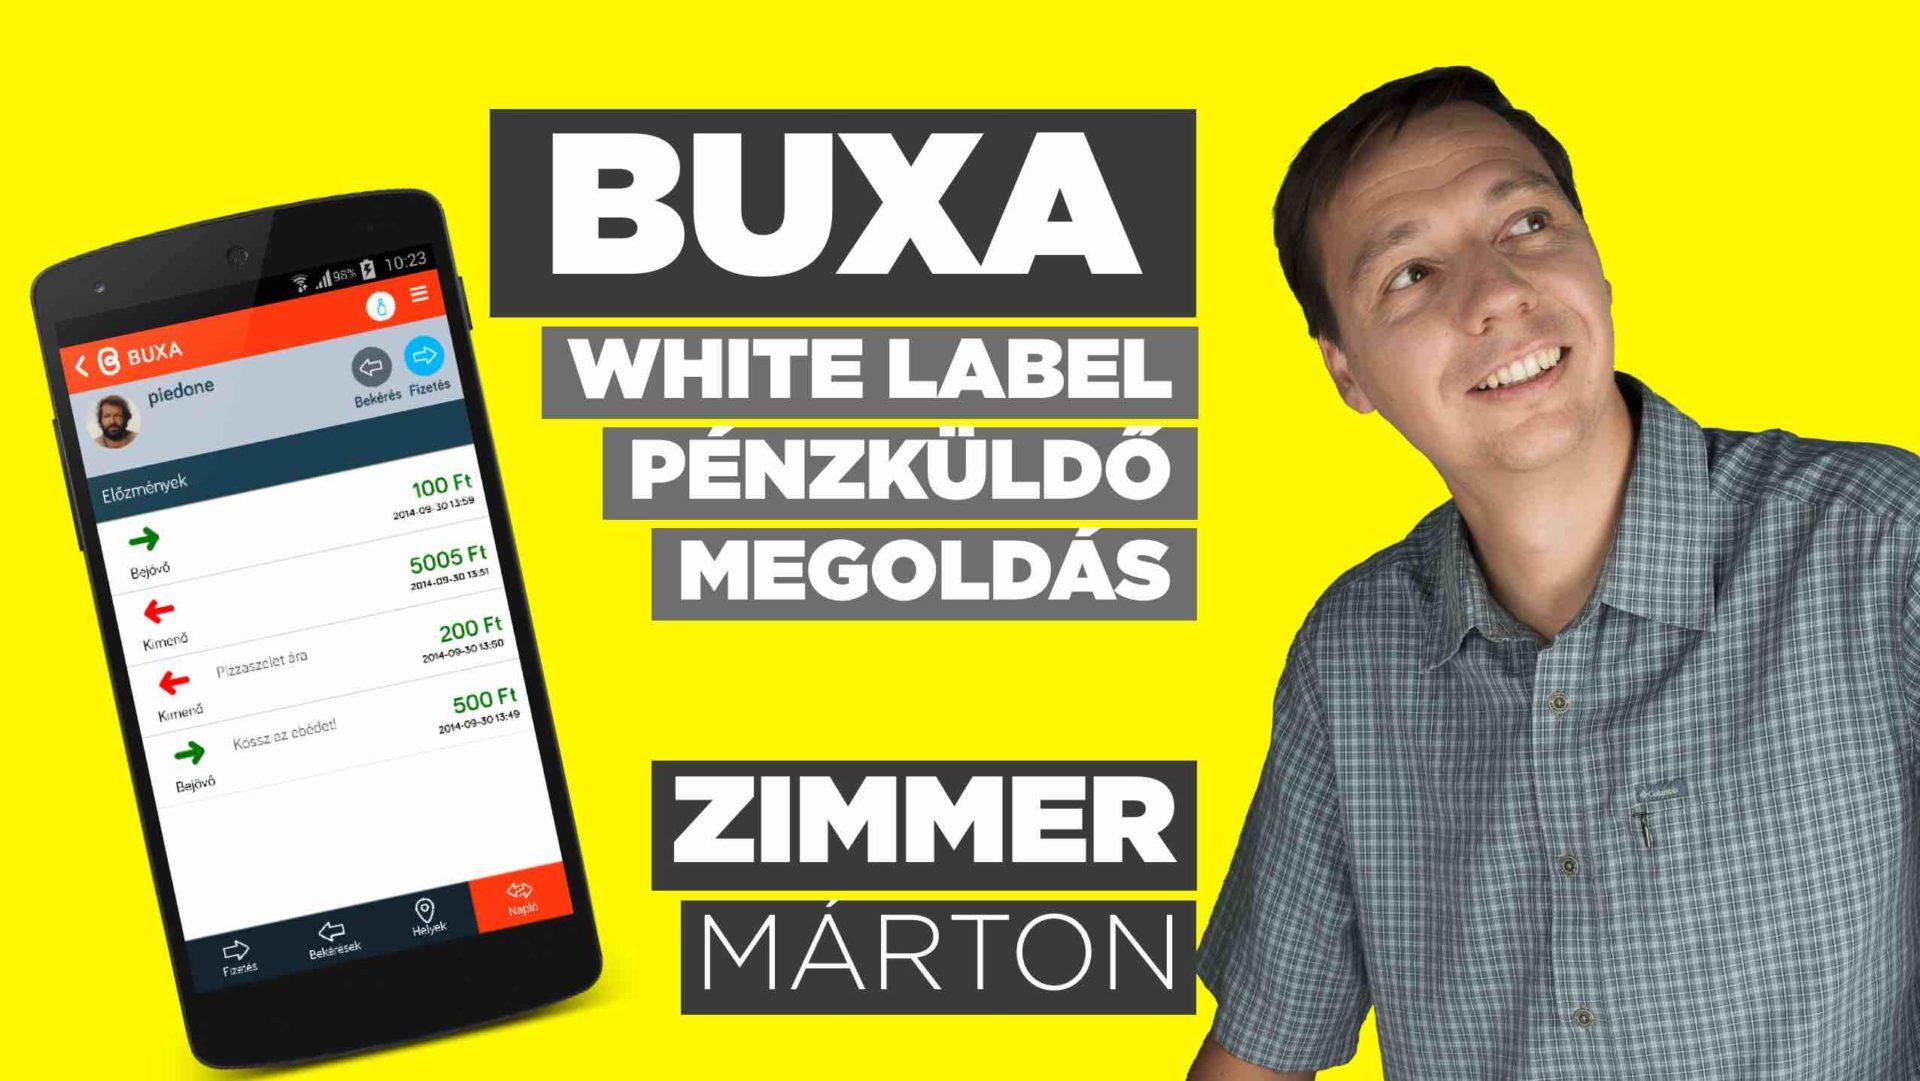 Mit adnak nekünk a legmenőbb magyar fintech cégek? – Buxa